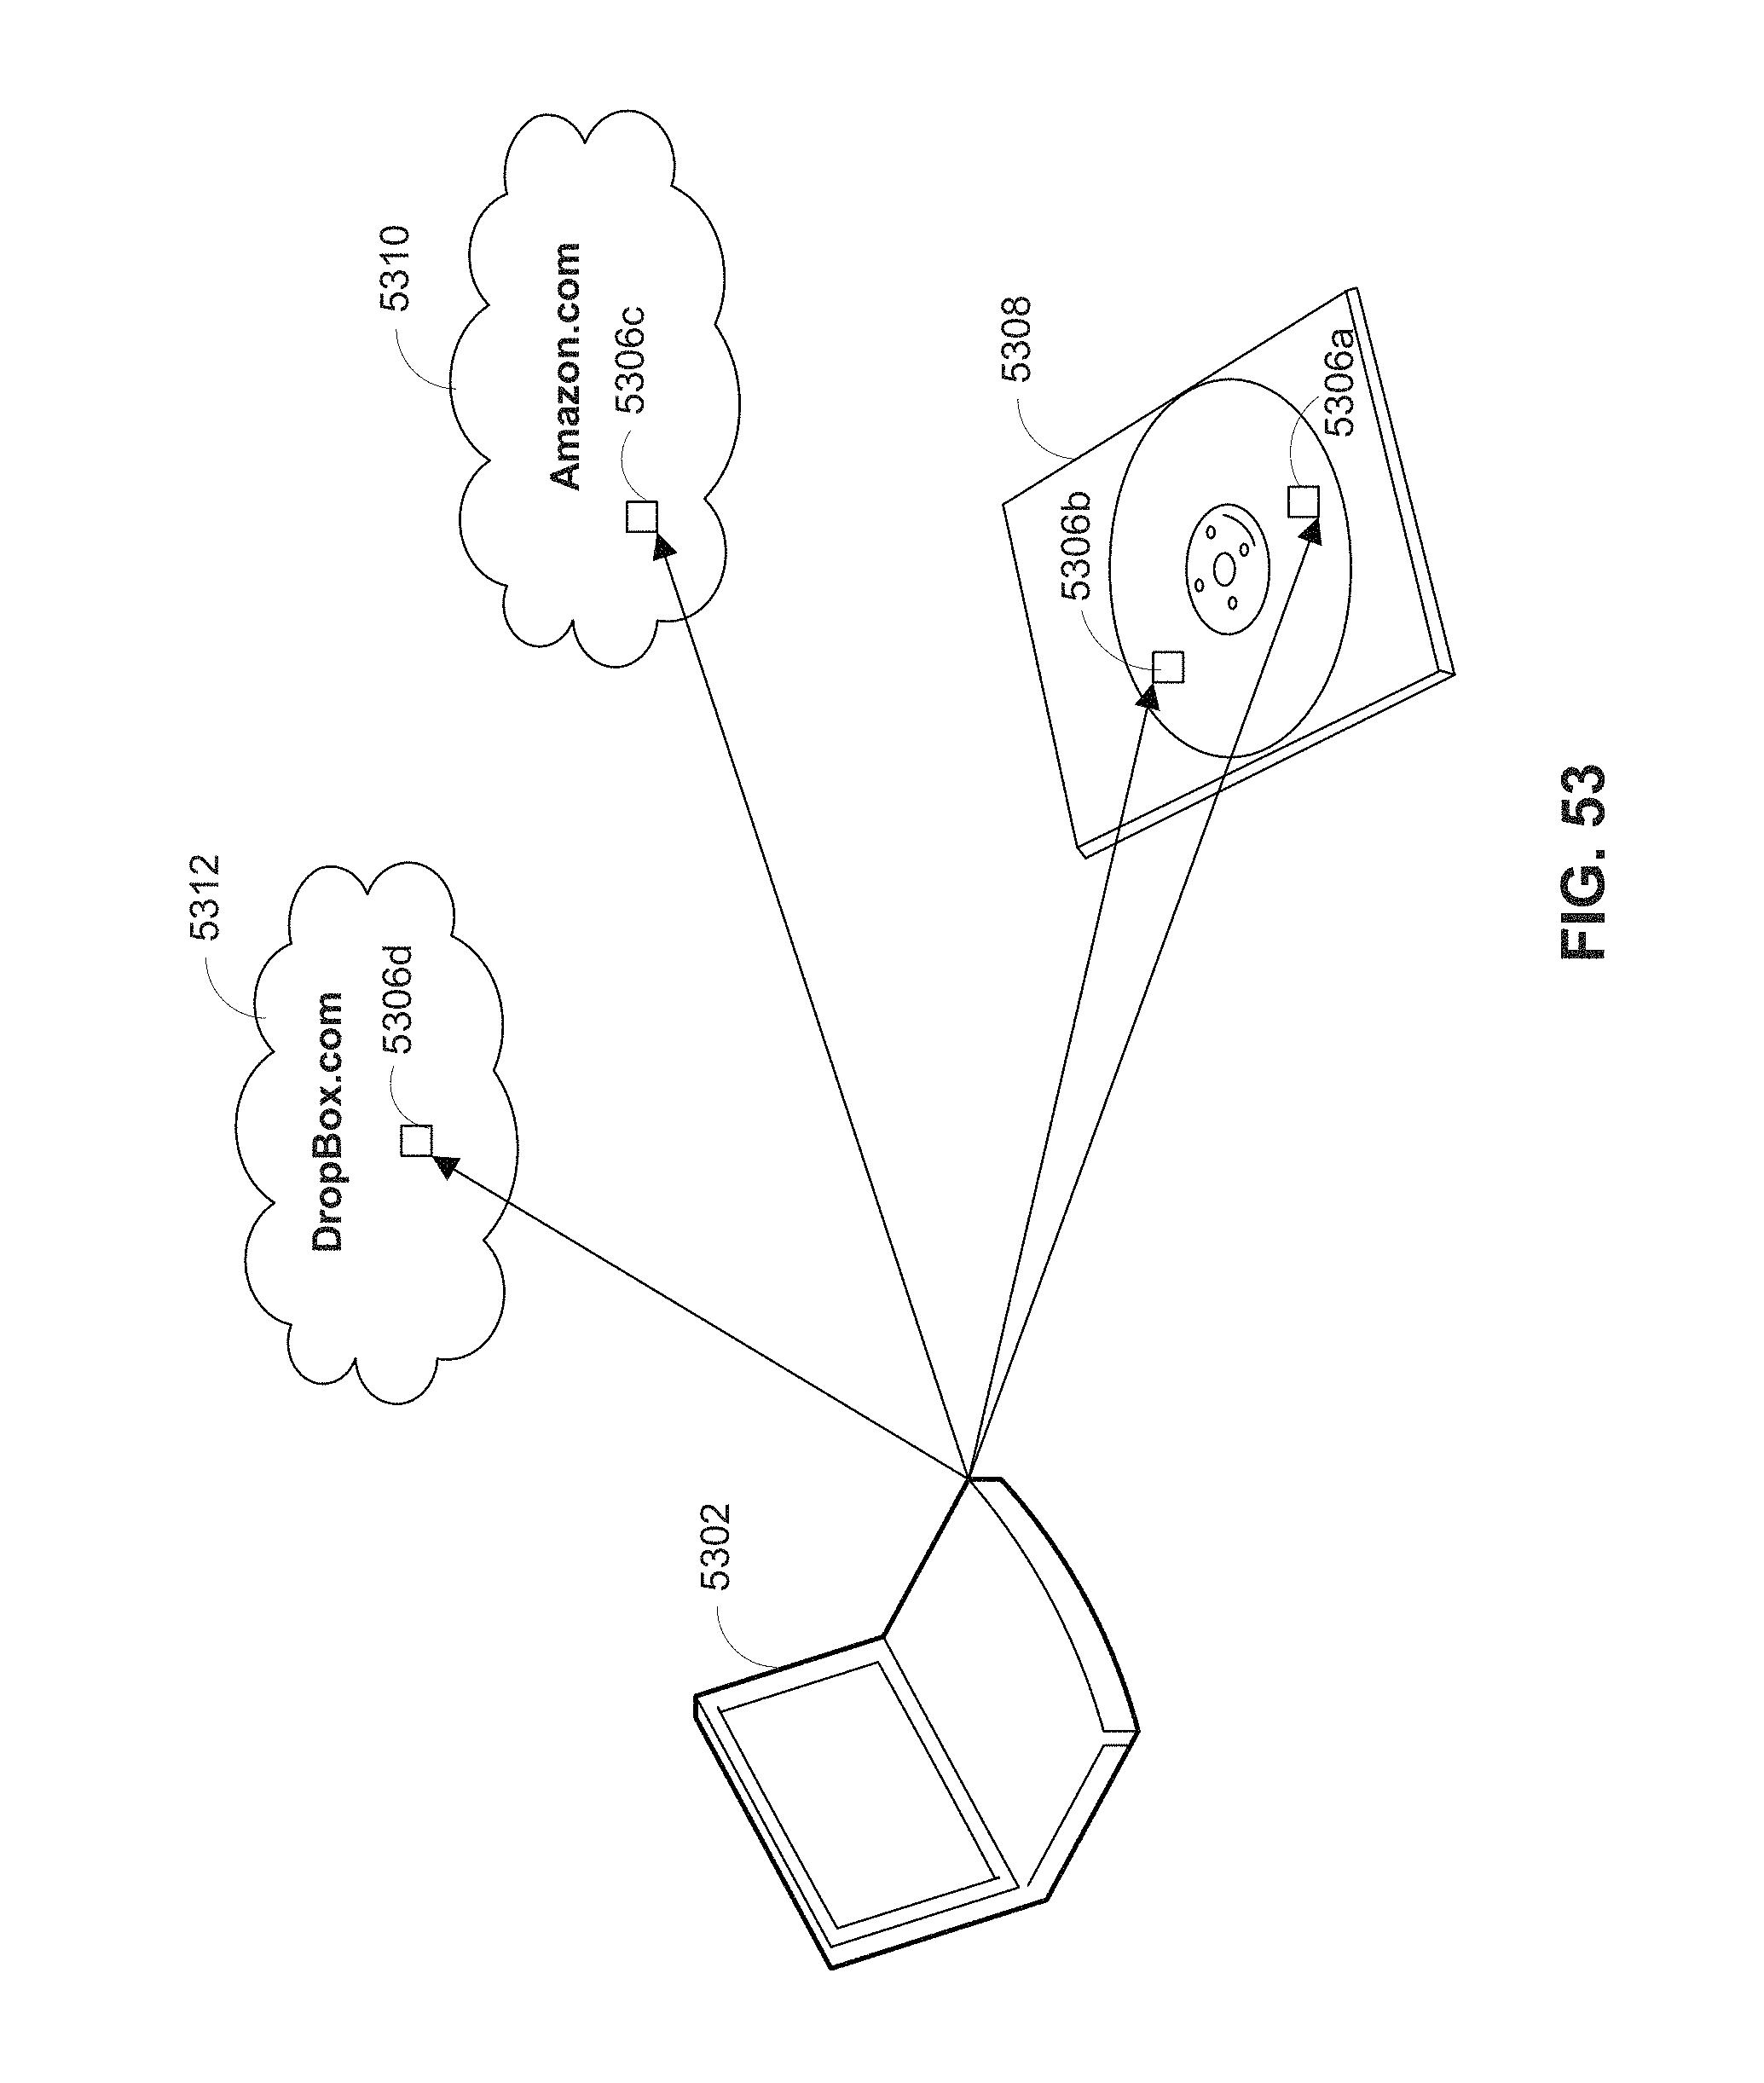 patent us 9 785 785 b2 VP Level Resume Example patent images